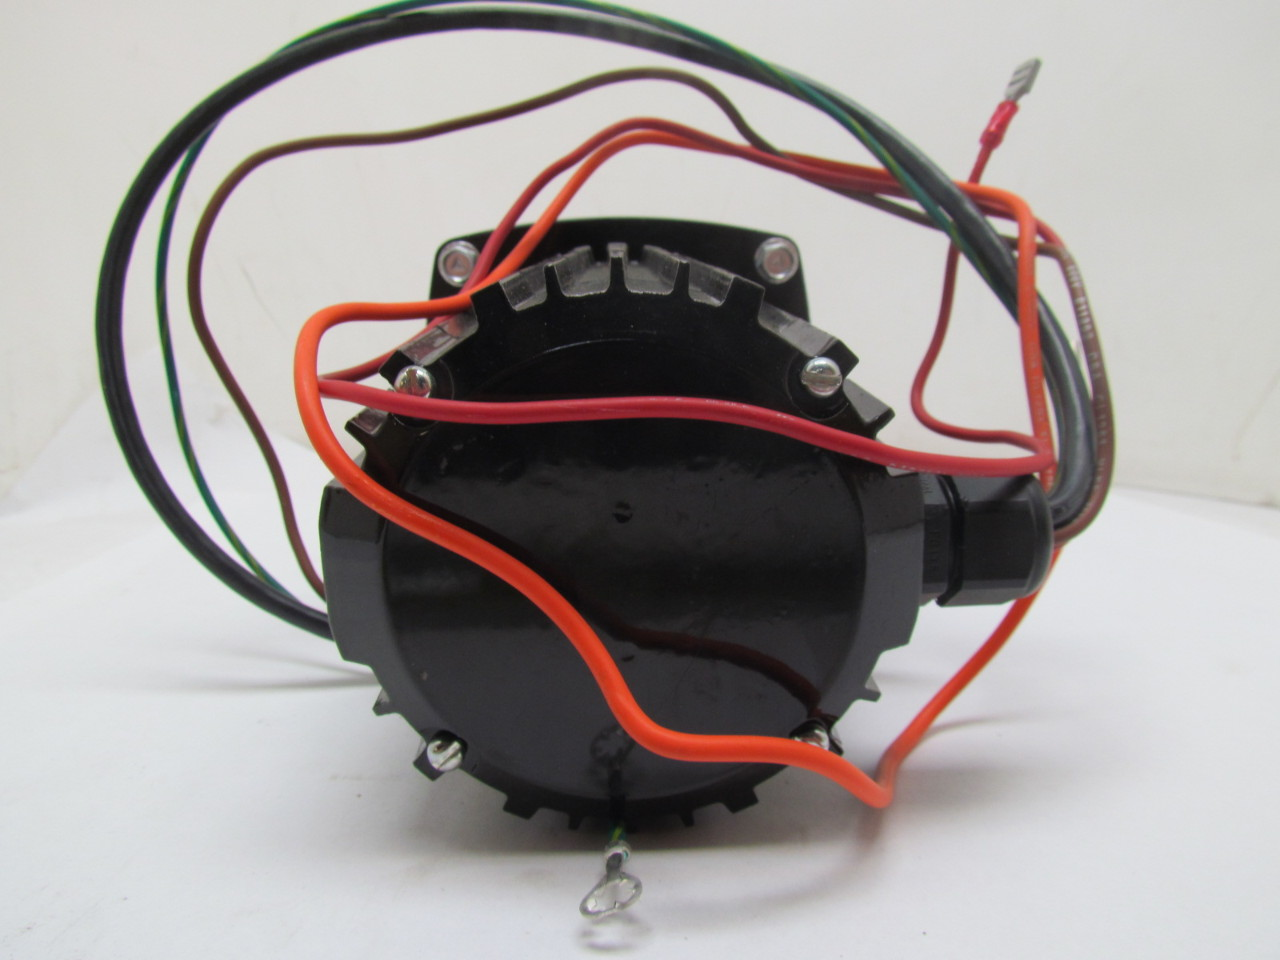 58762 bodine electric 34b6bebl f3 24v gearmotor 18amp 3 8hp 125rpm 201 ratio 9?resize\\\\\\\\\\\\\\\=665%2C499 bodine motor wiring diagram wiring diagram shrutiradio bodine dc motor wiring diagram at soozxer.org